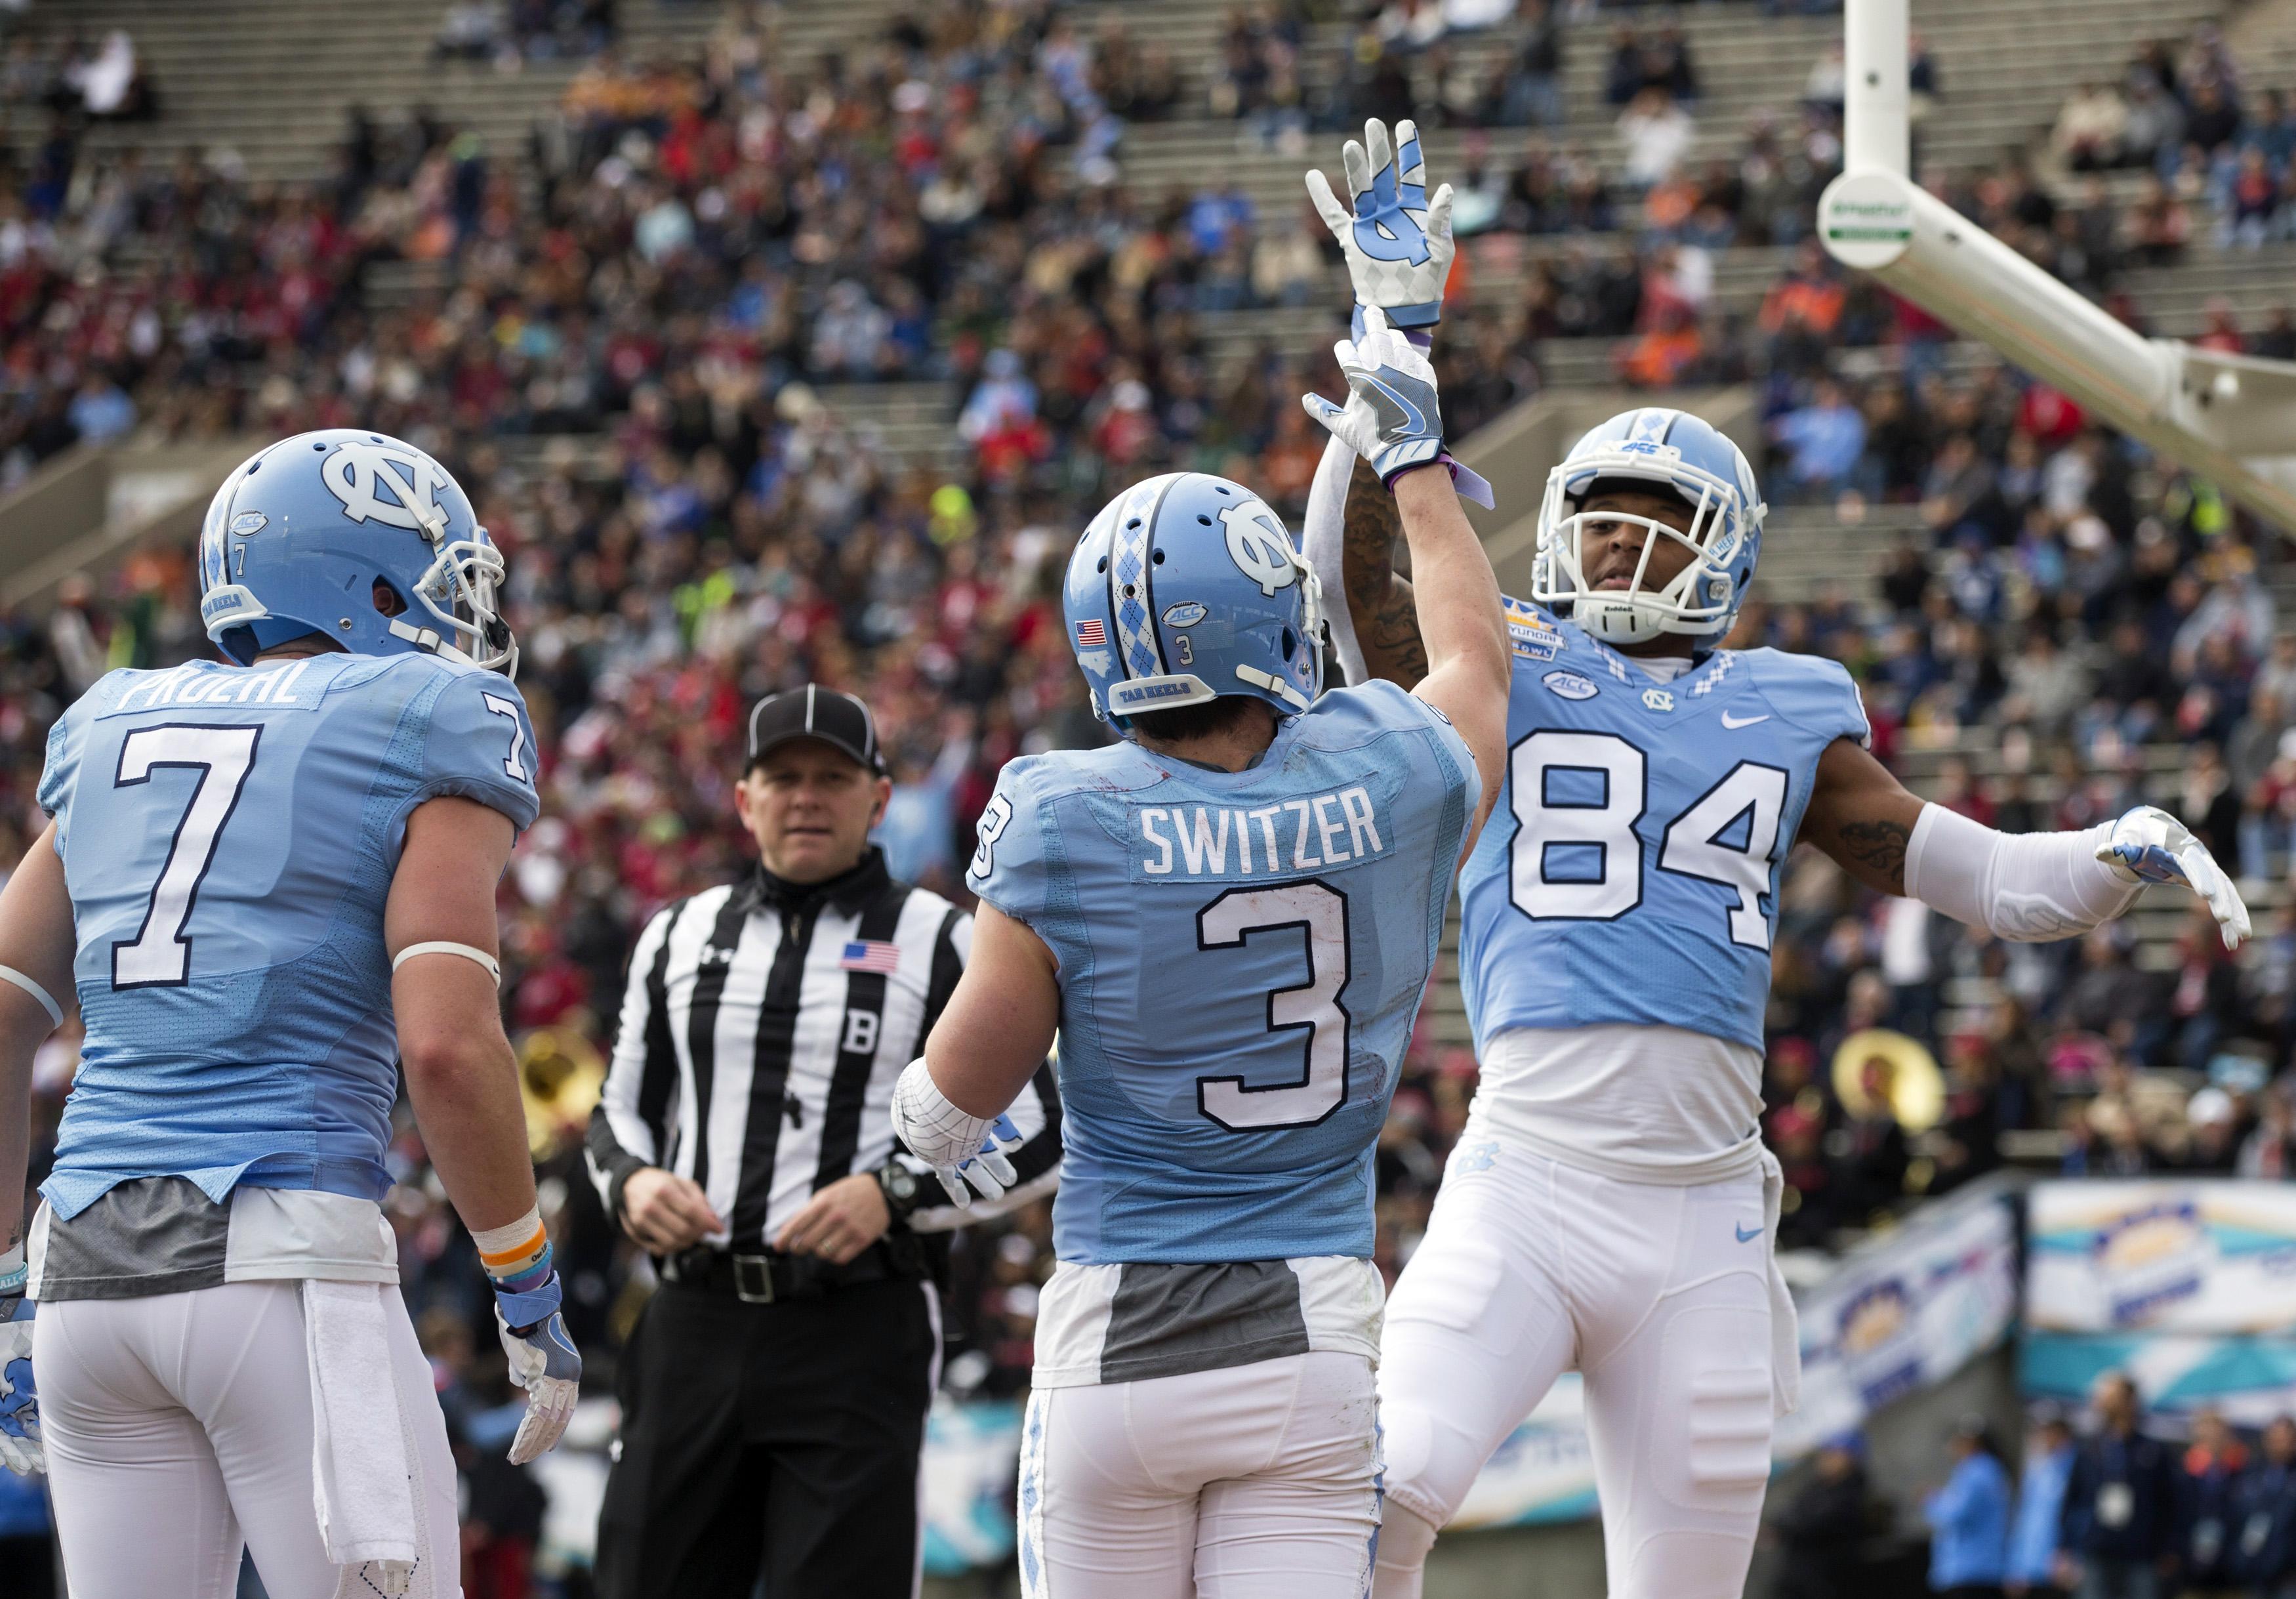 North Carolina Tar Heels: Ryan Switzer and the Comparisons